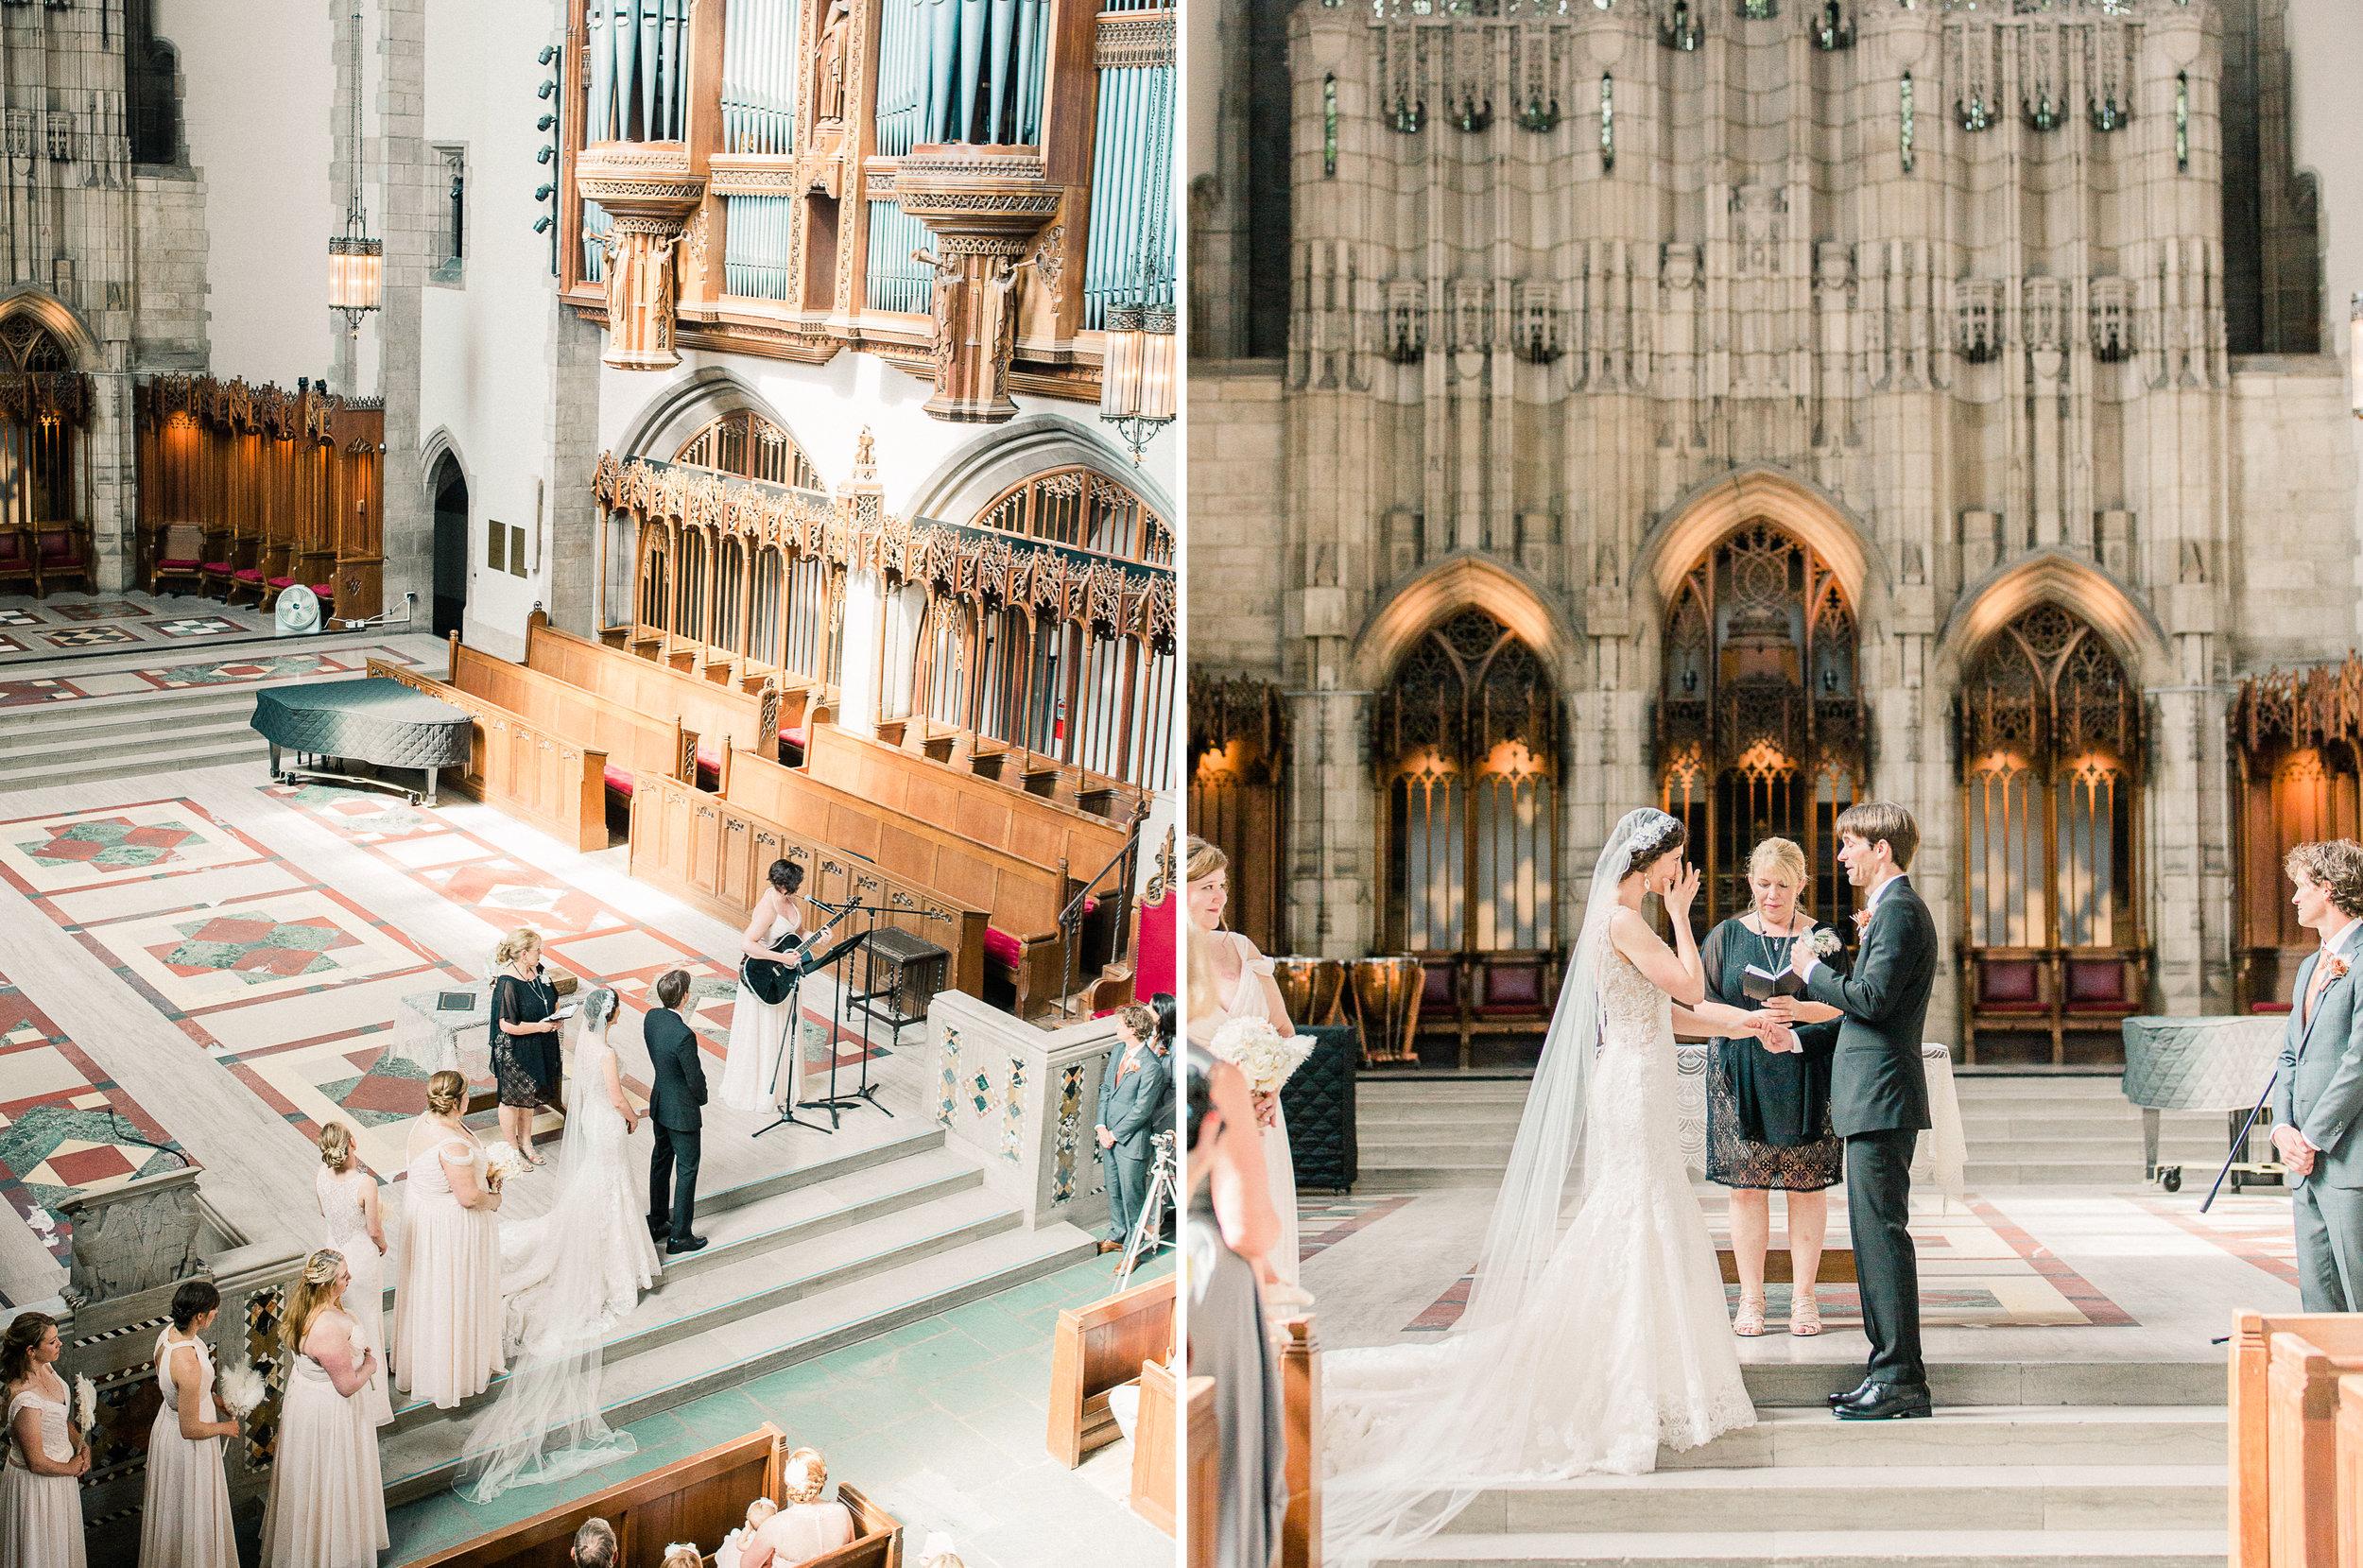 Dorothy_Louise_Photography_University_of_Chicago_Wedding5.jpg